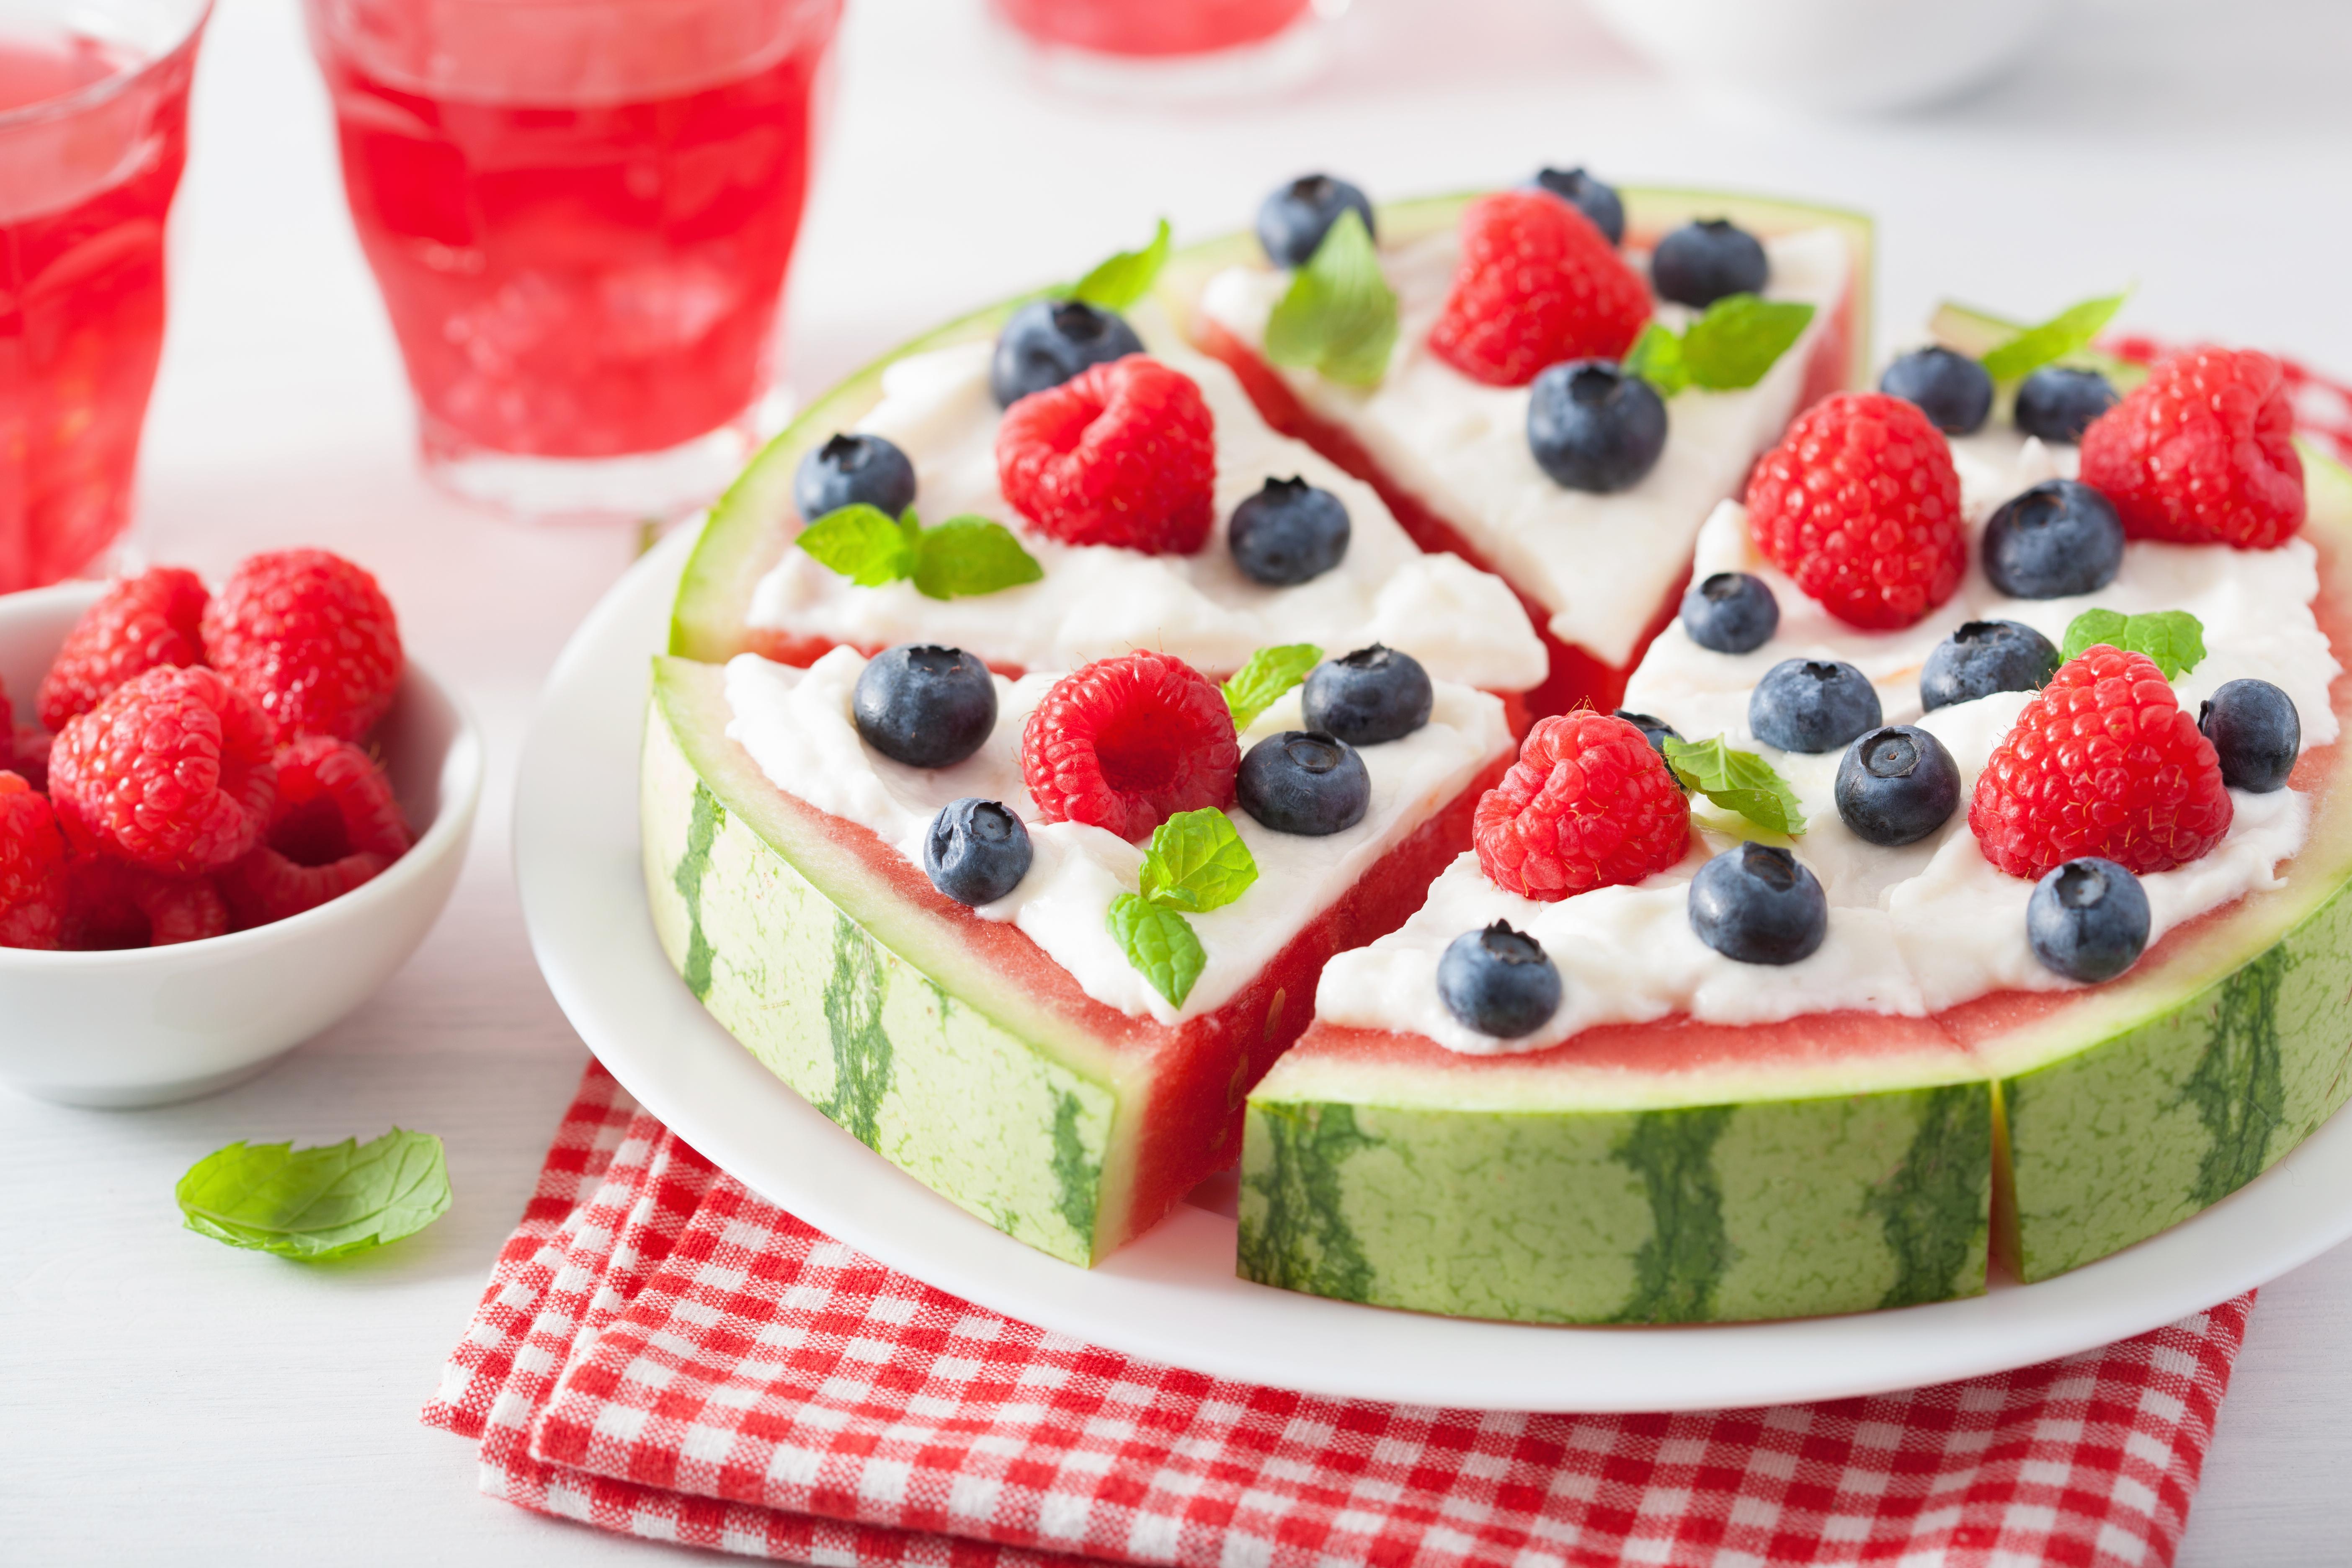 Celebrity Caterer Andrea Correale Shares Summer Recipes